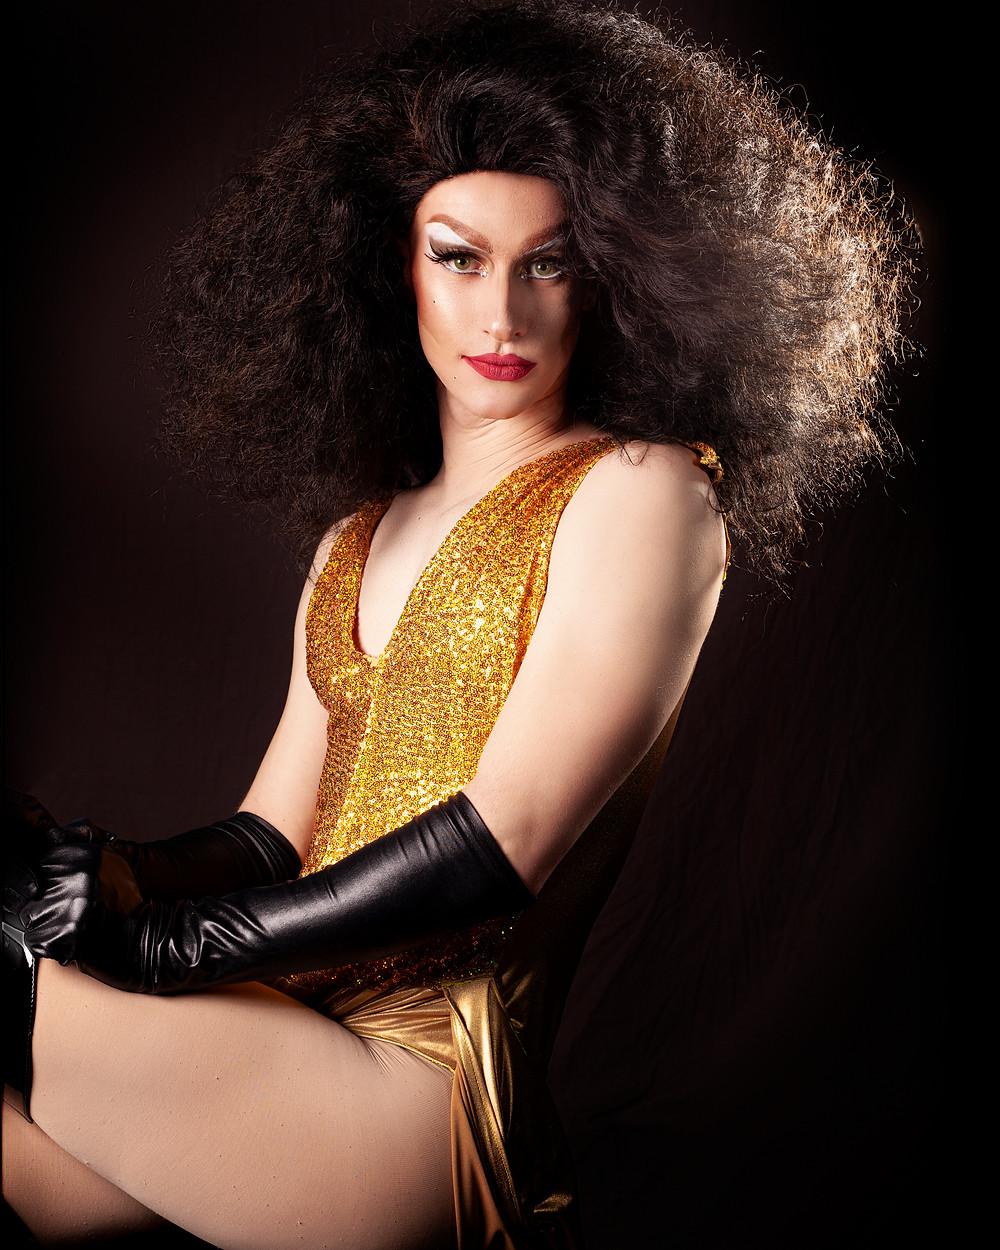 Drag Queen, yellow bodysuit and black gloves